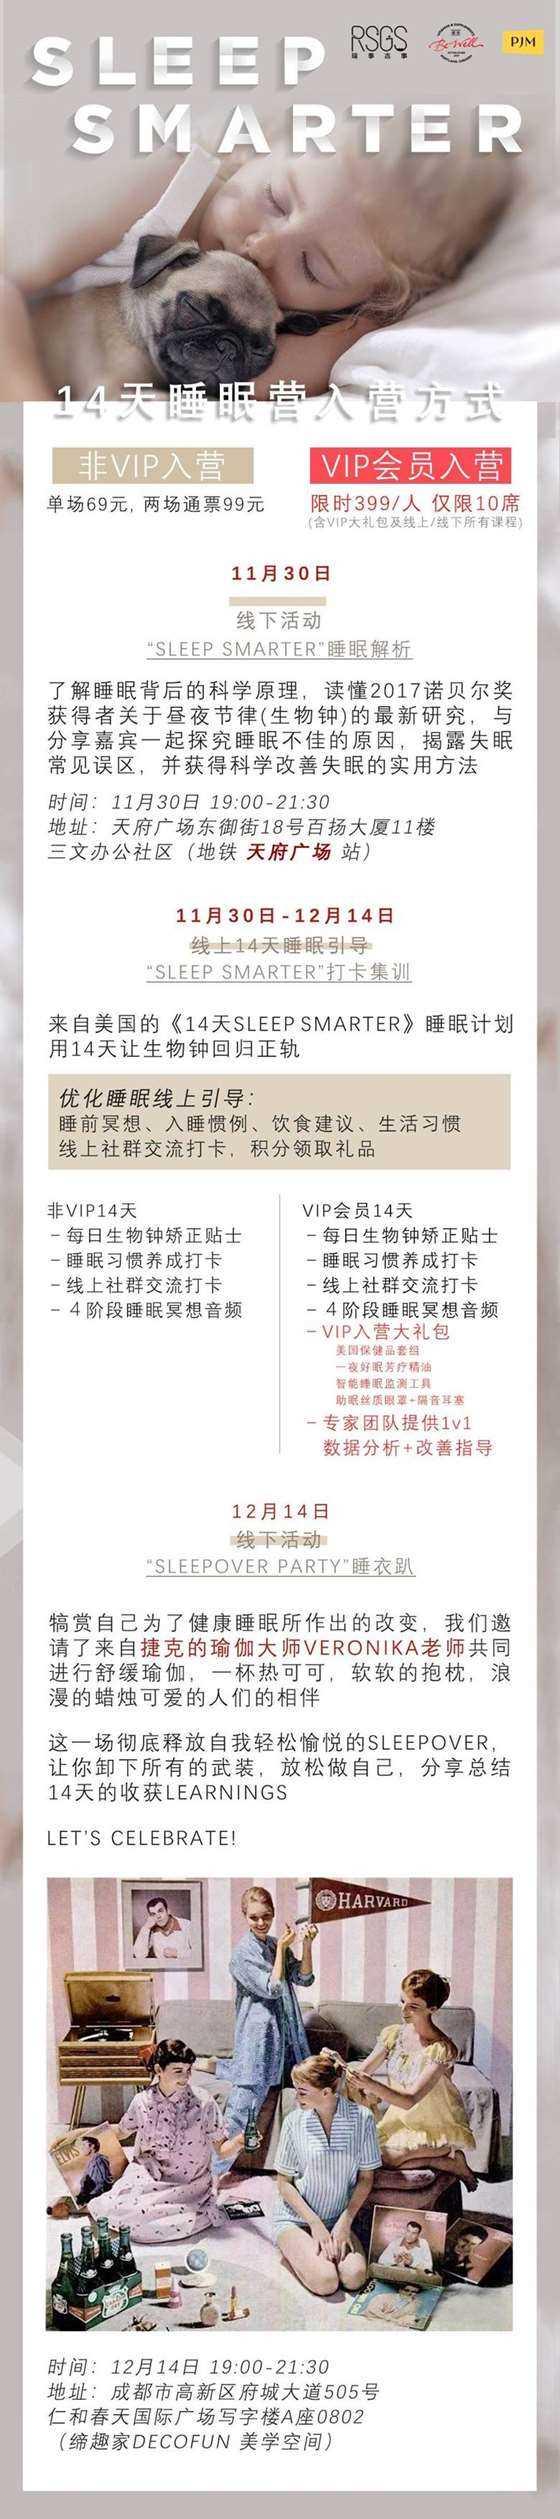 sleep smarter 入营流方式 11.24最新.jpg